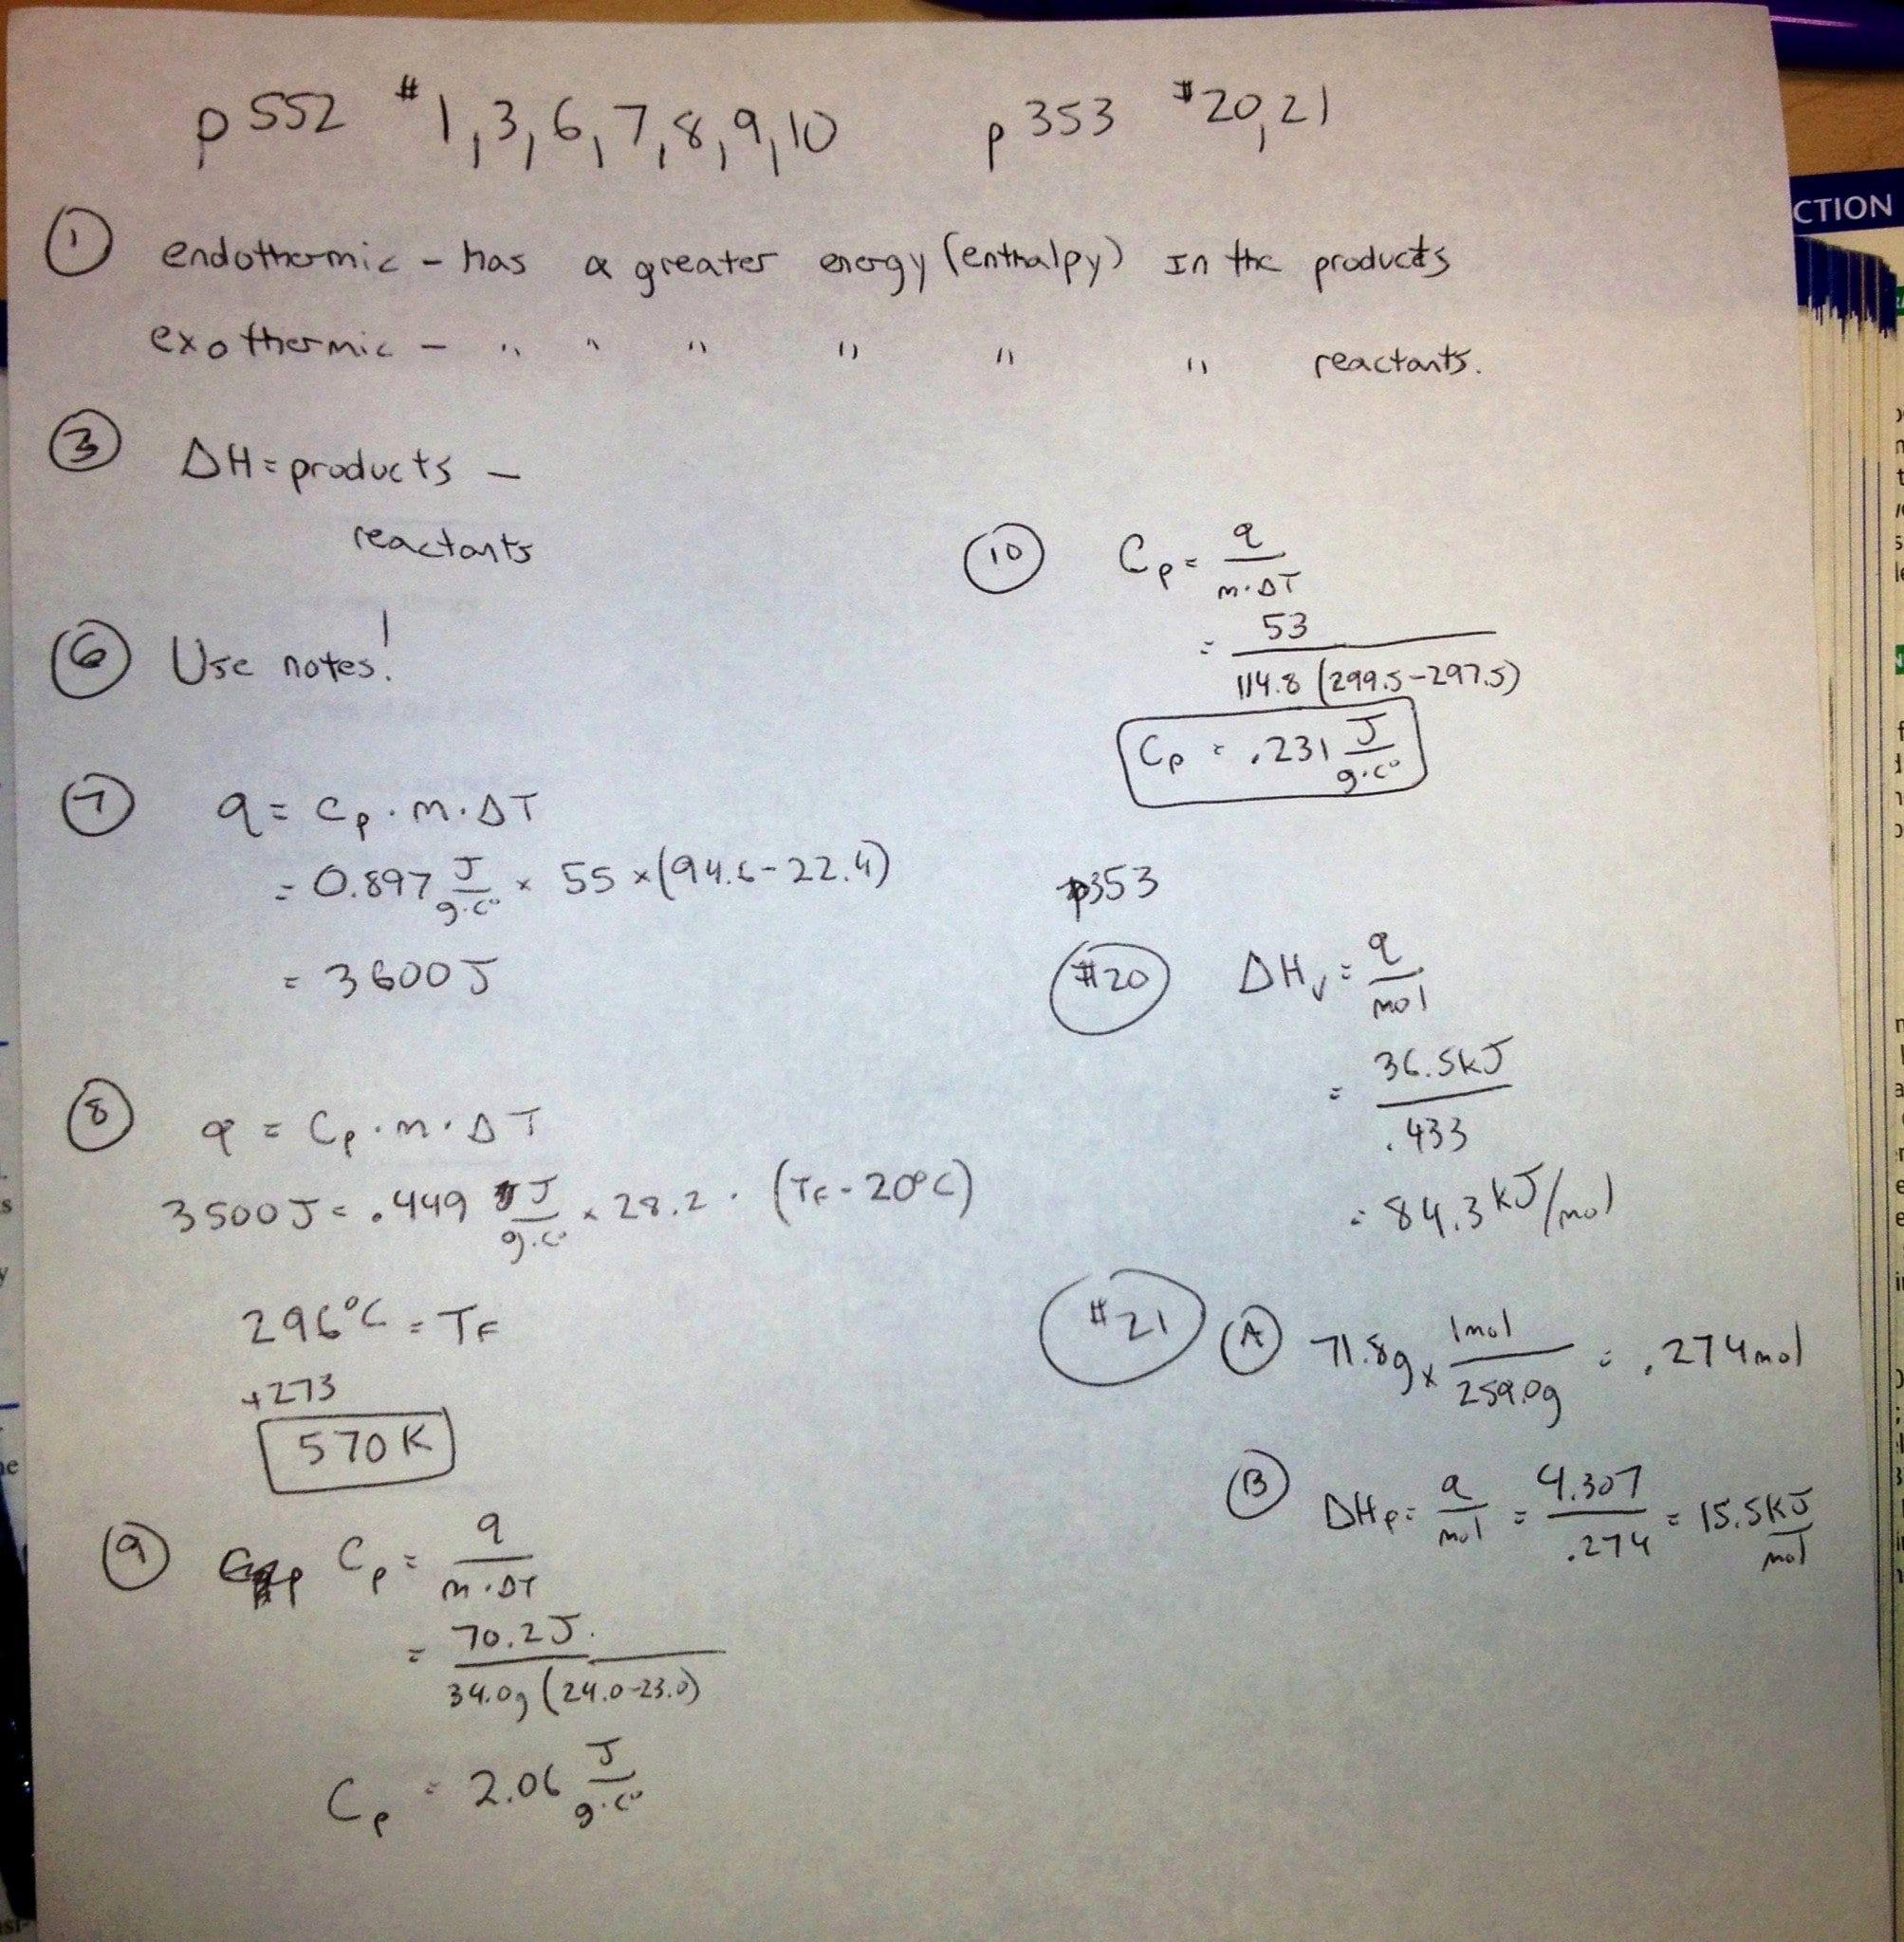 Lewis Dot Diagrams Chem Worksheet 5 7 Answer Key Inspirational Lewis With Lewis Dot Diagrams Chem Worksheet 5 7 Key